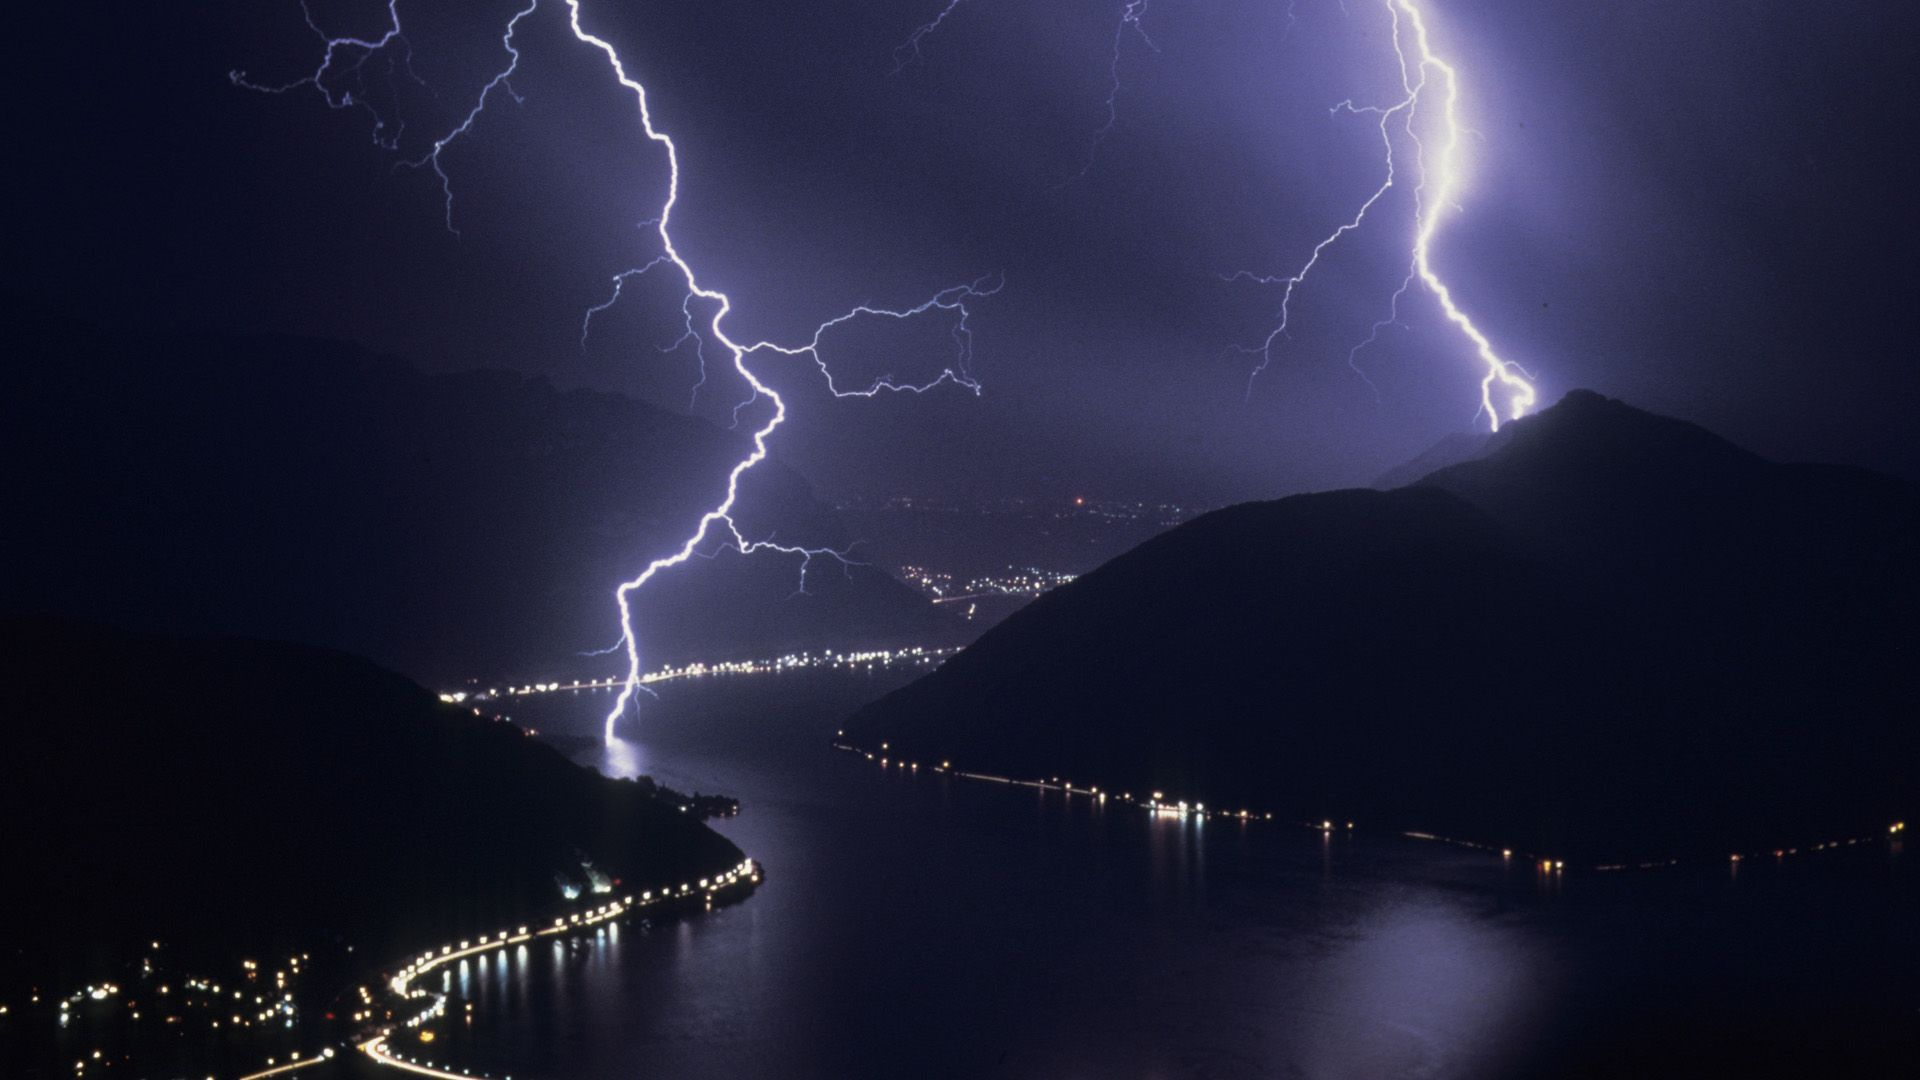 Lighting srorms are awsome. | Lighting Storms | Pinterest ...